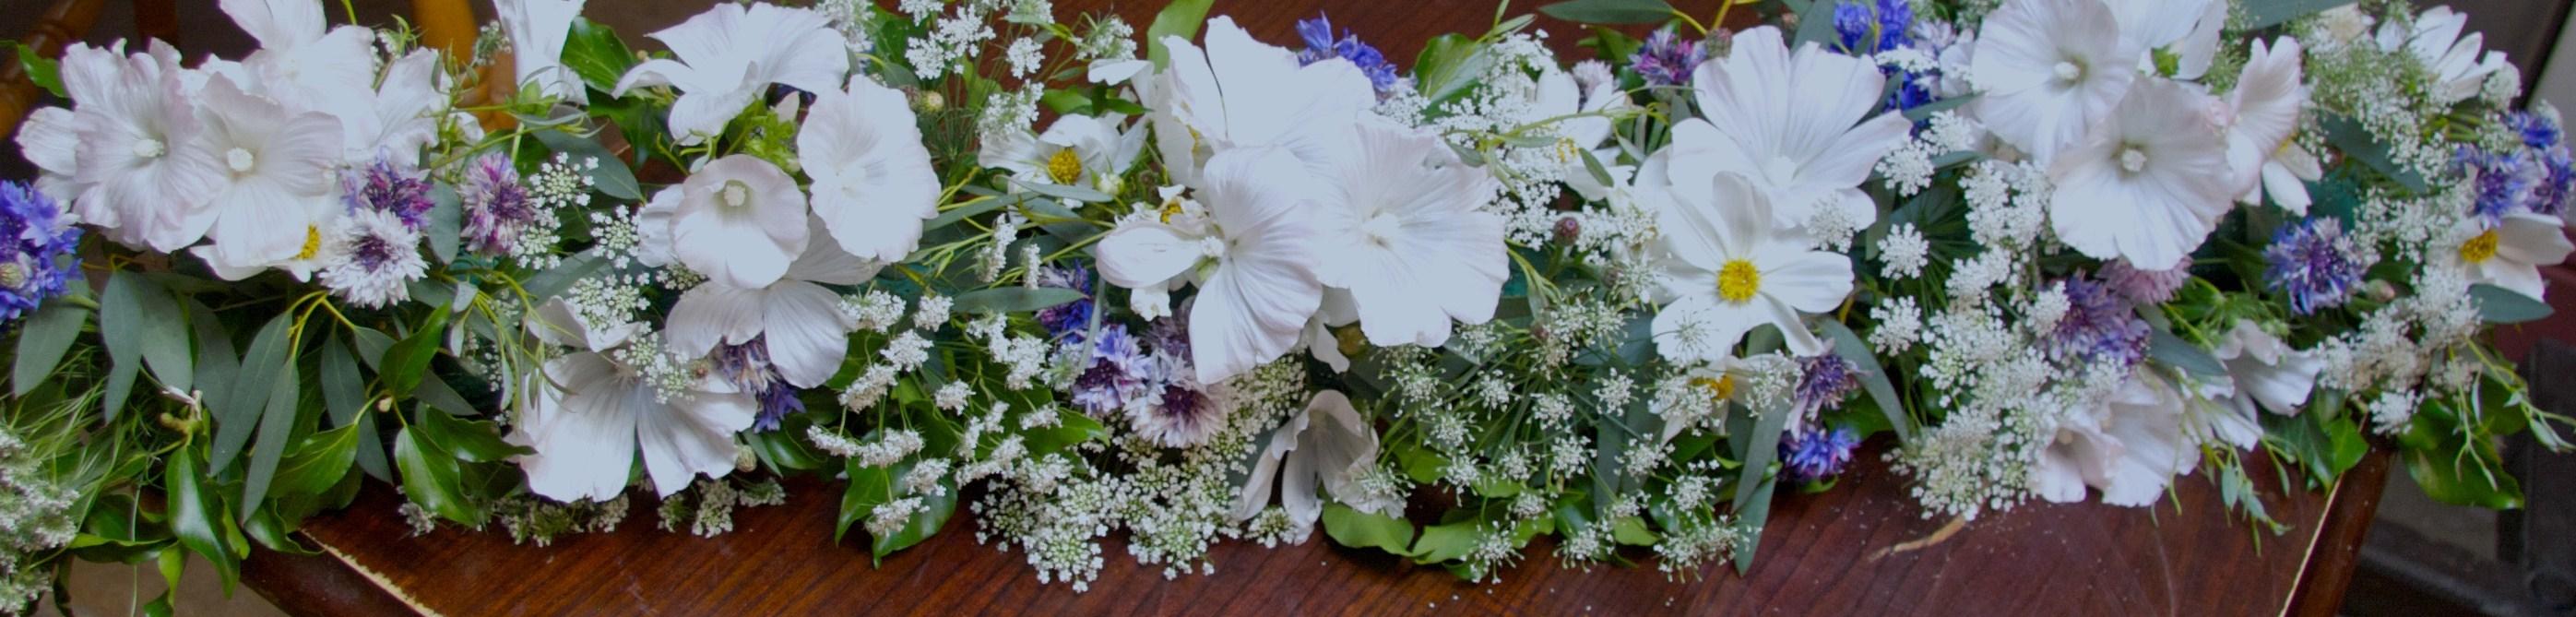 Flower Arrangements 366